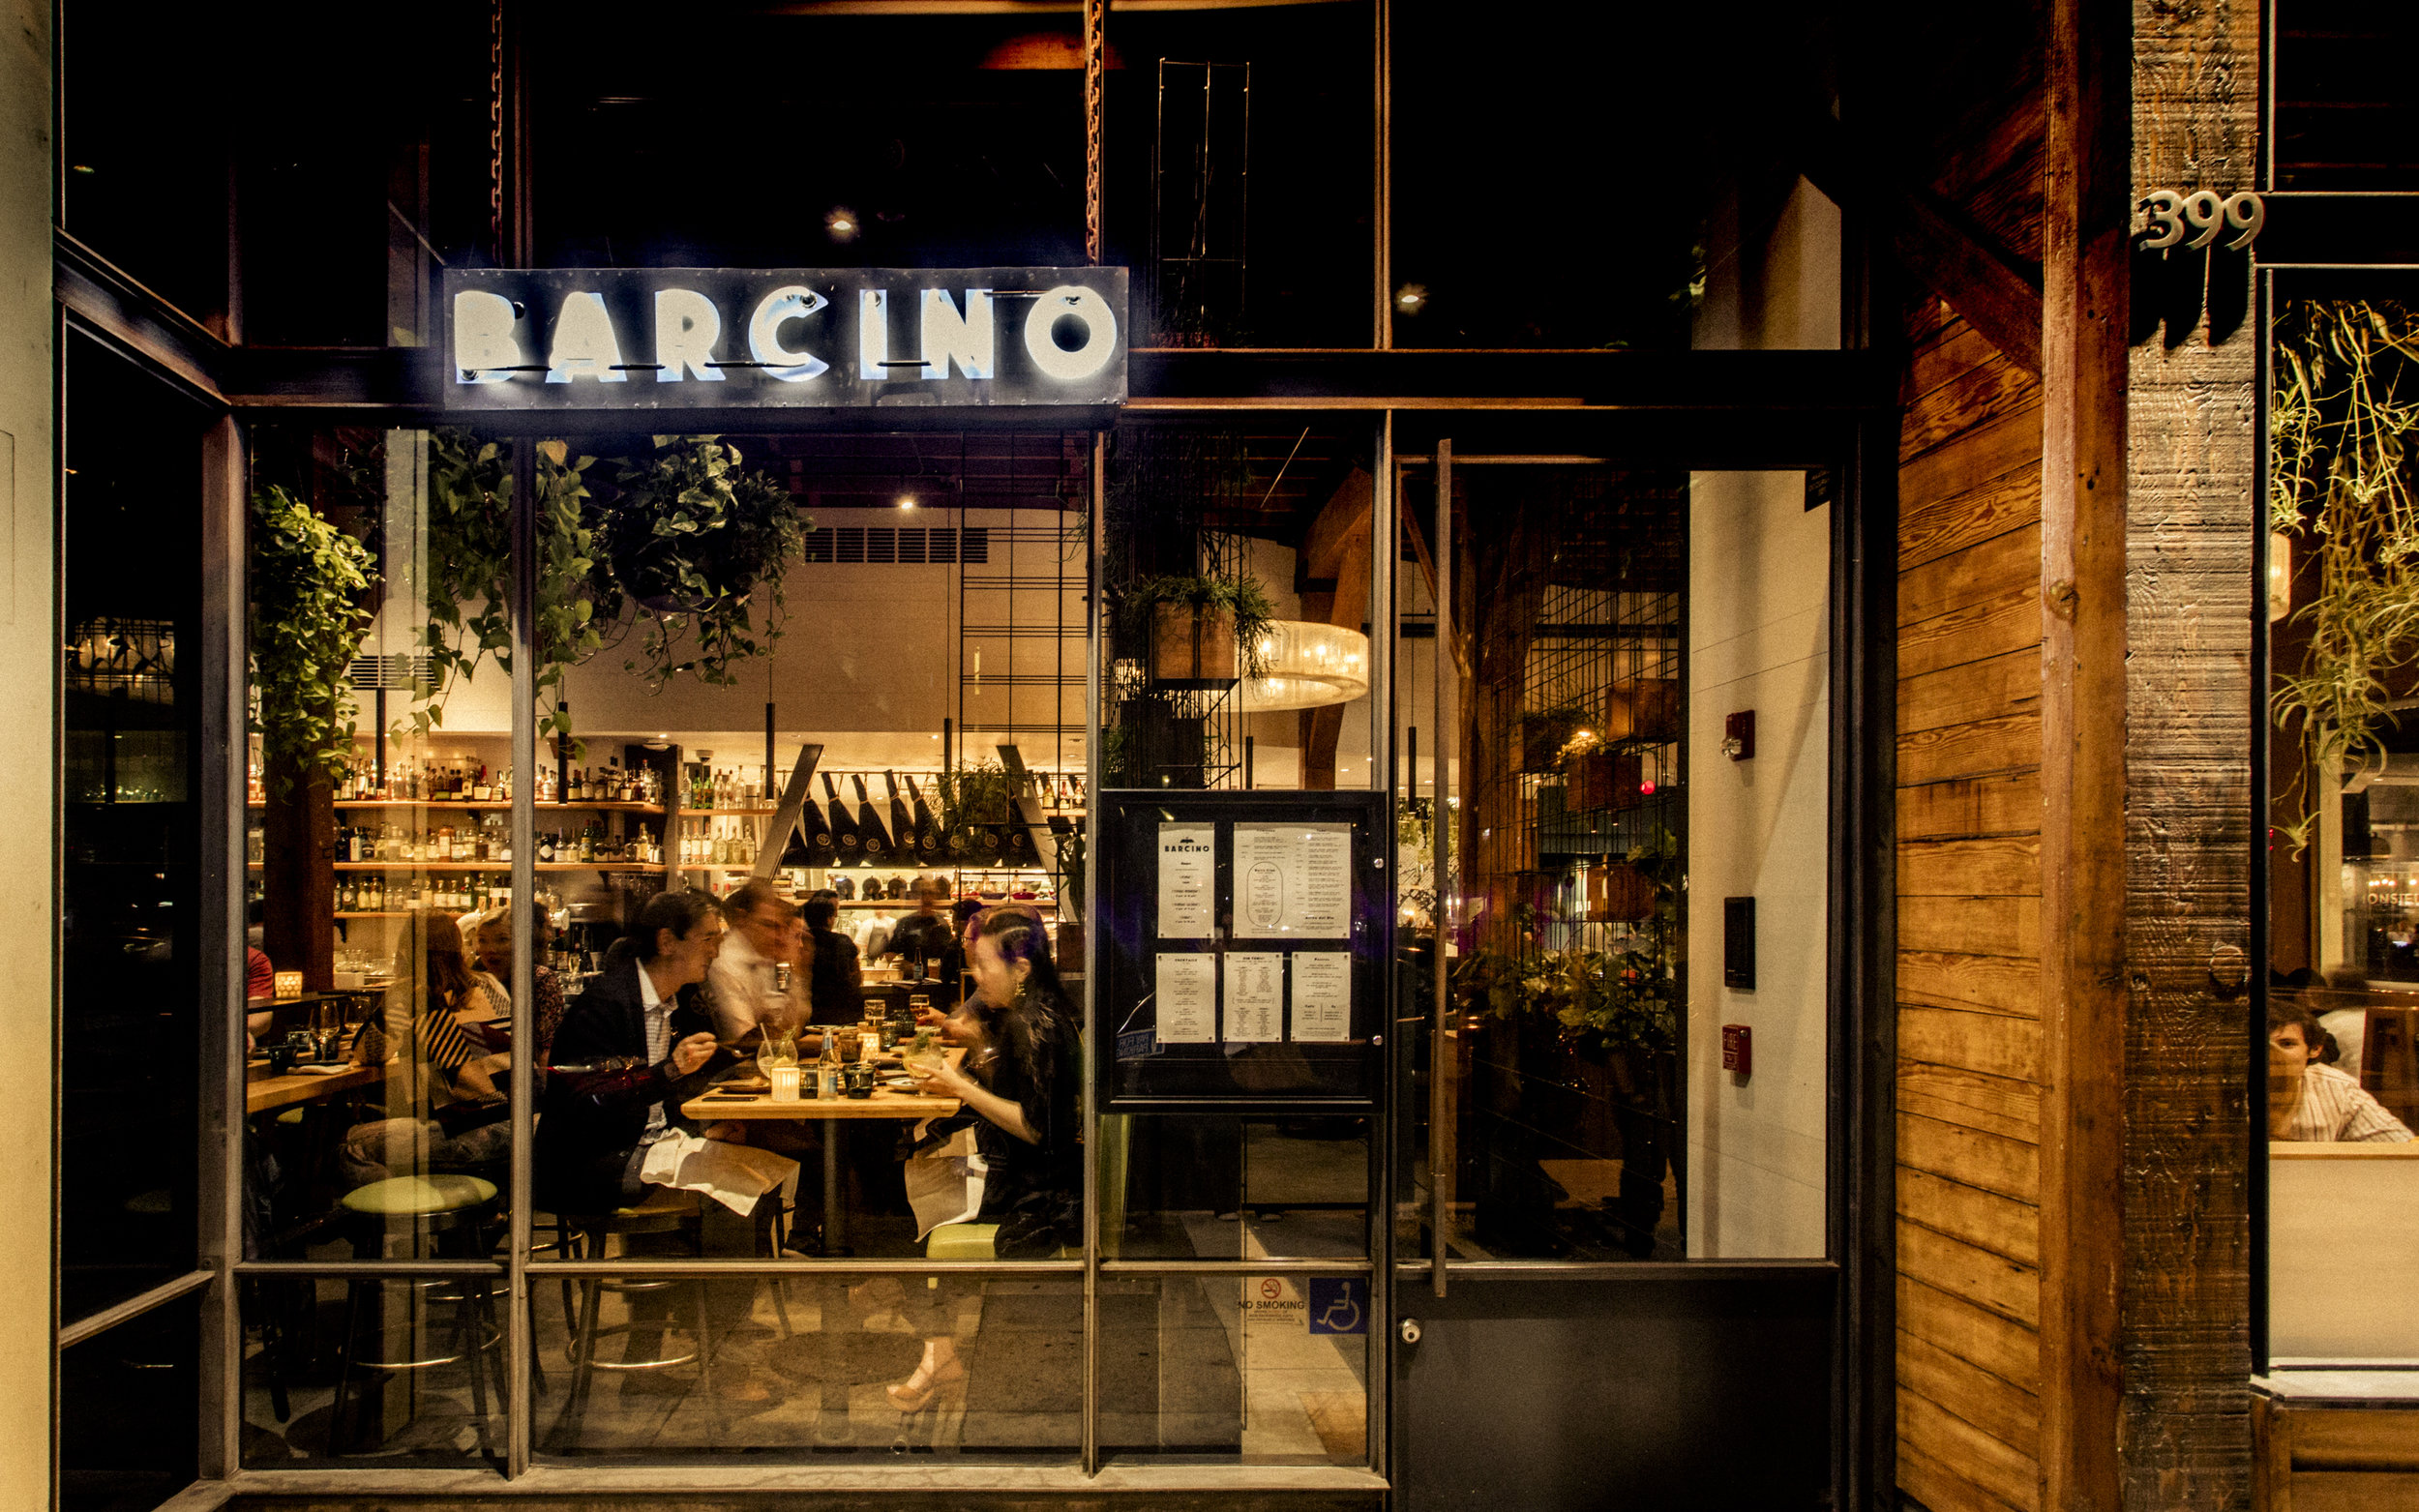 barcino_2017_1556.jpg